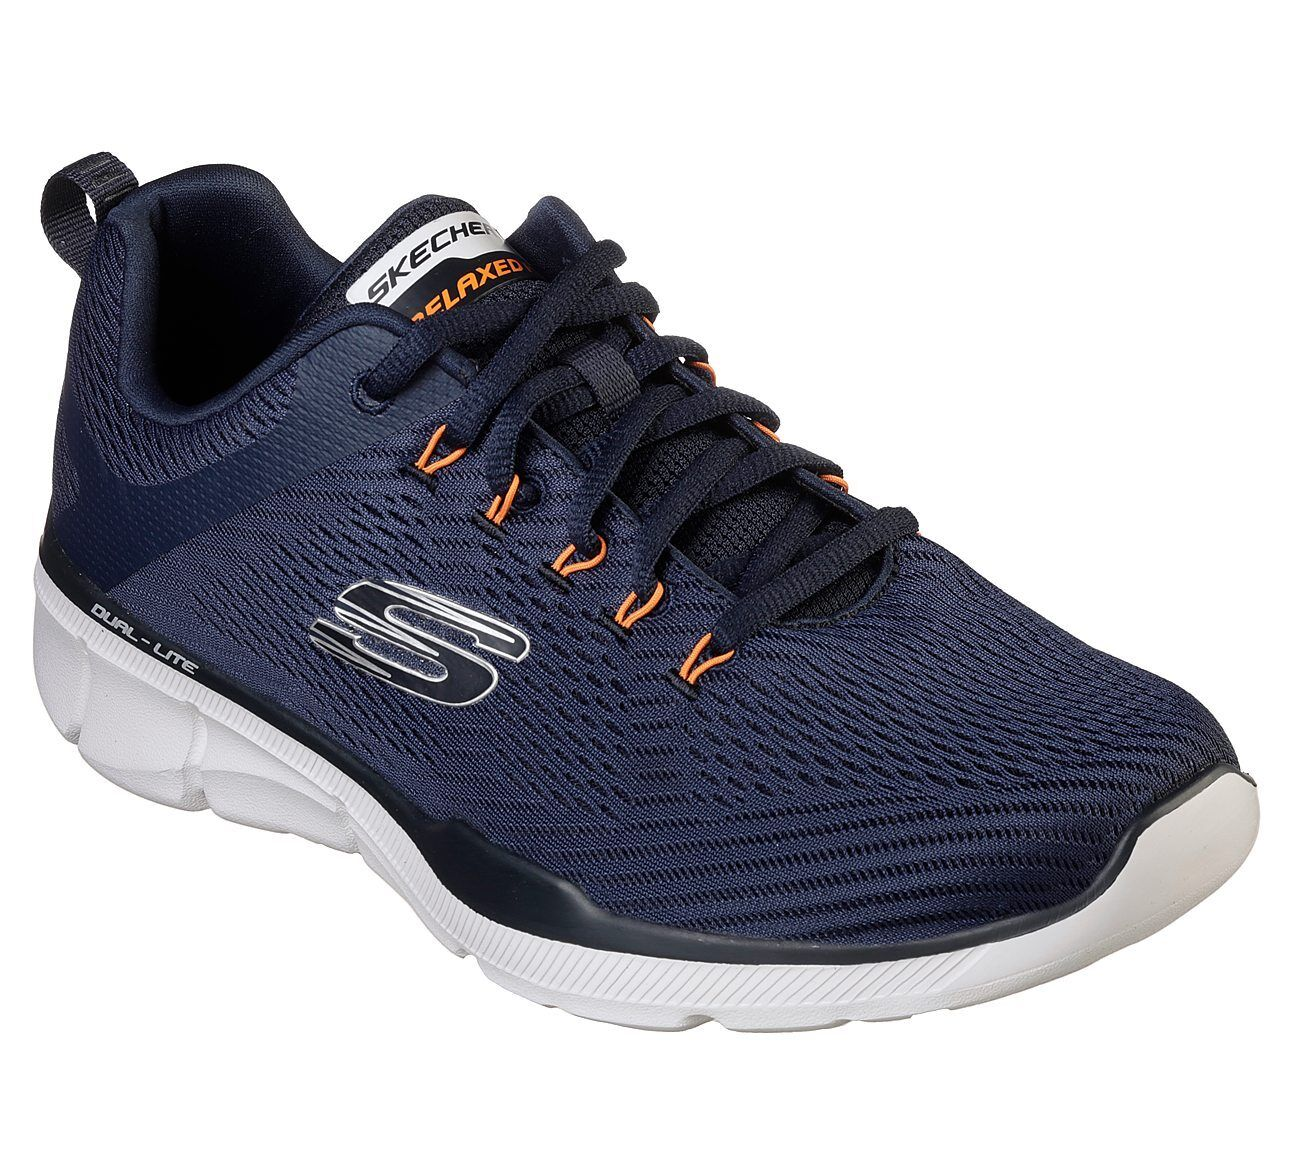 52927 Marina Naranja Skechers Zapatos Hombre Memoria Foam Malla tren Sport Comodidad